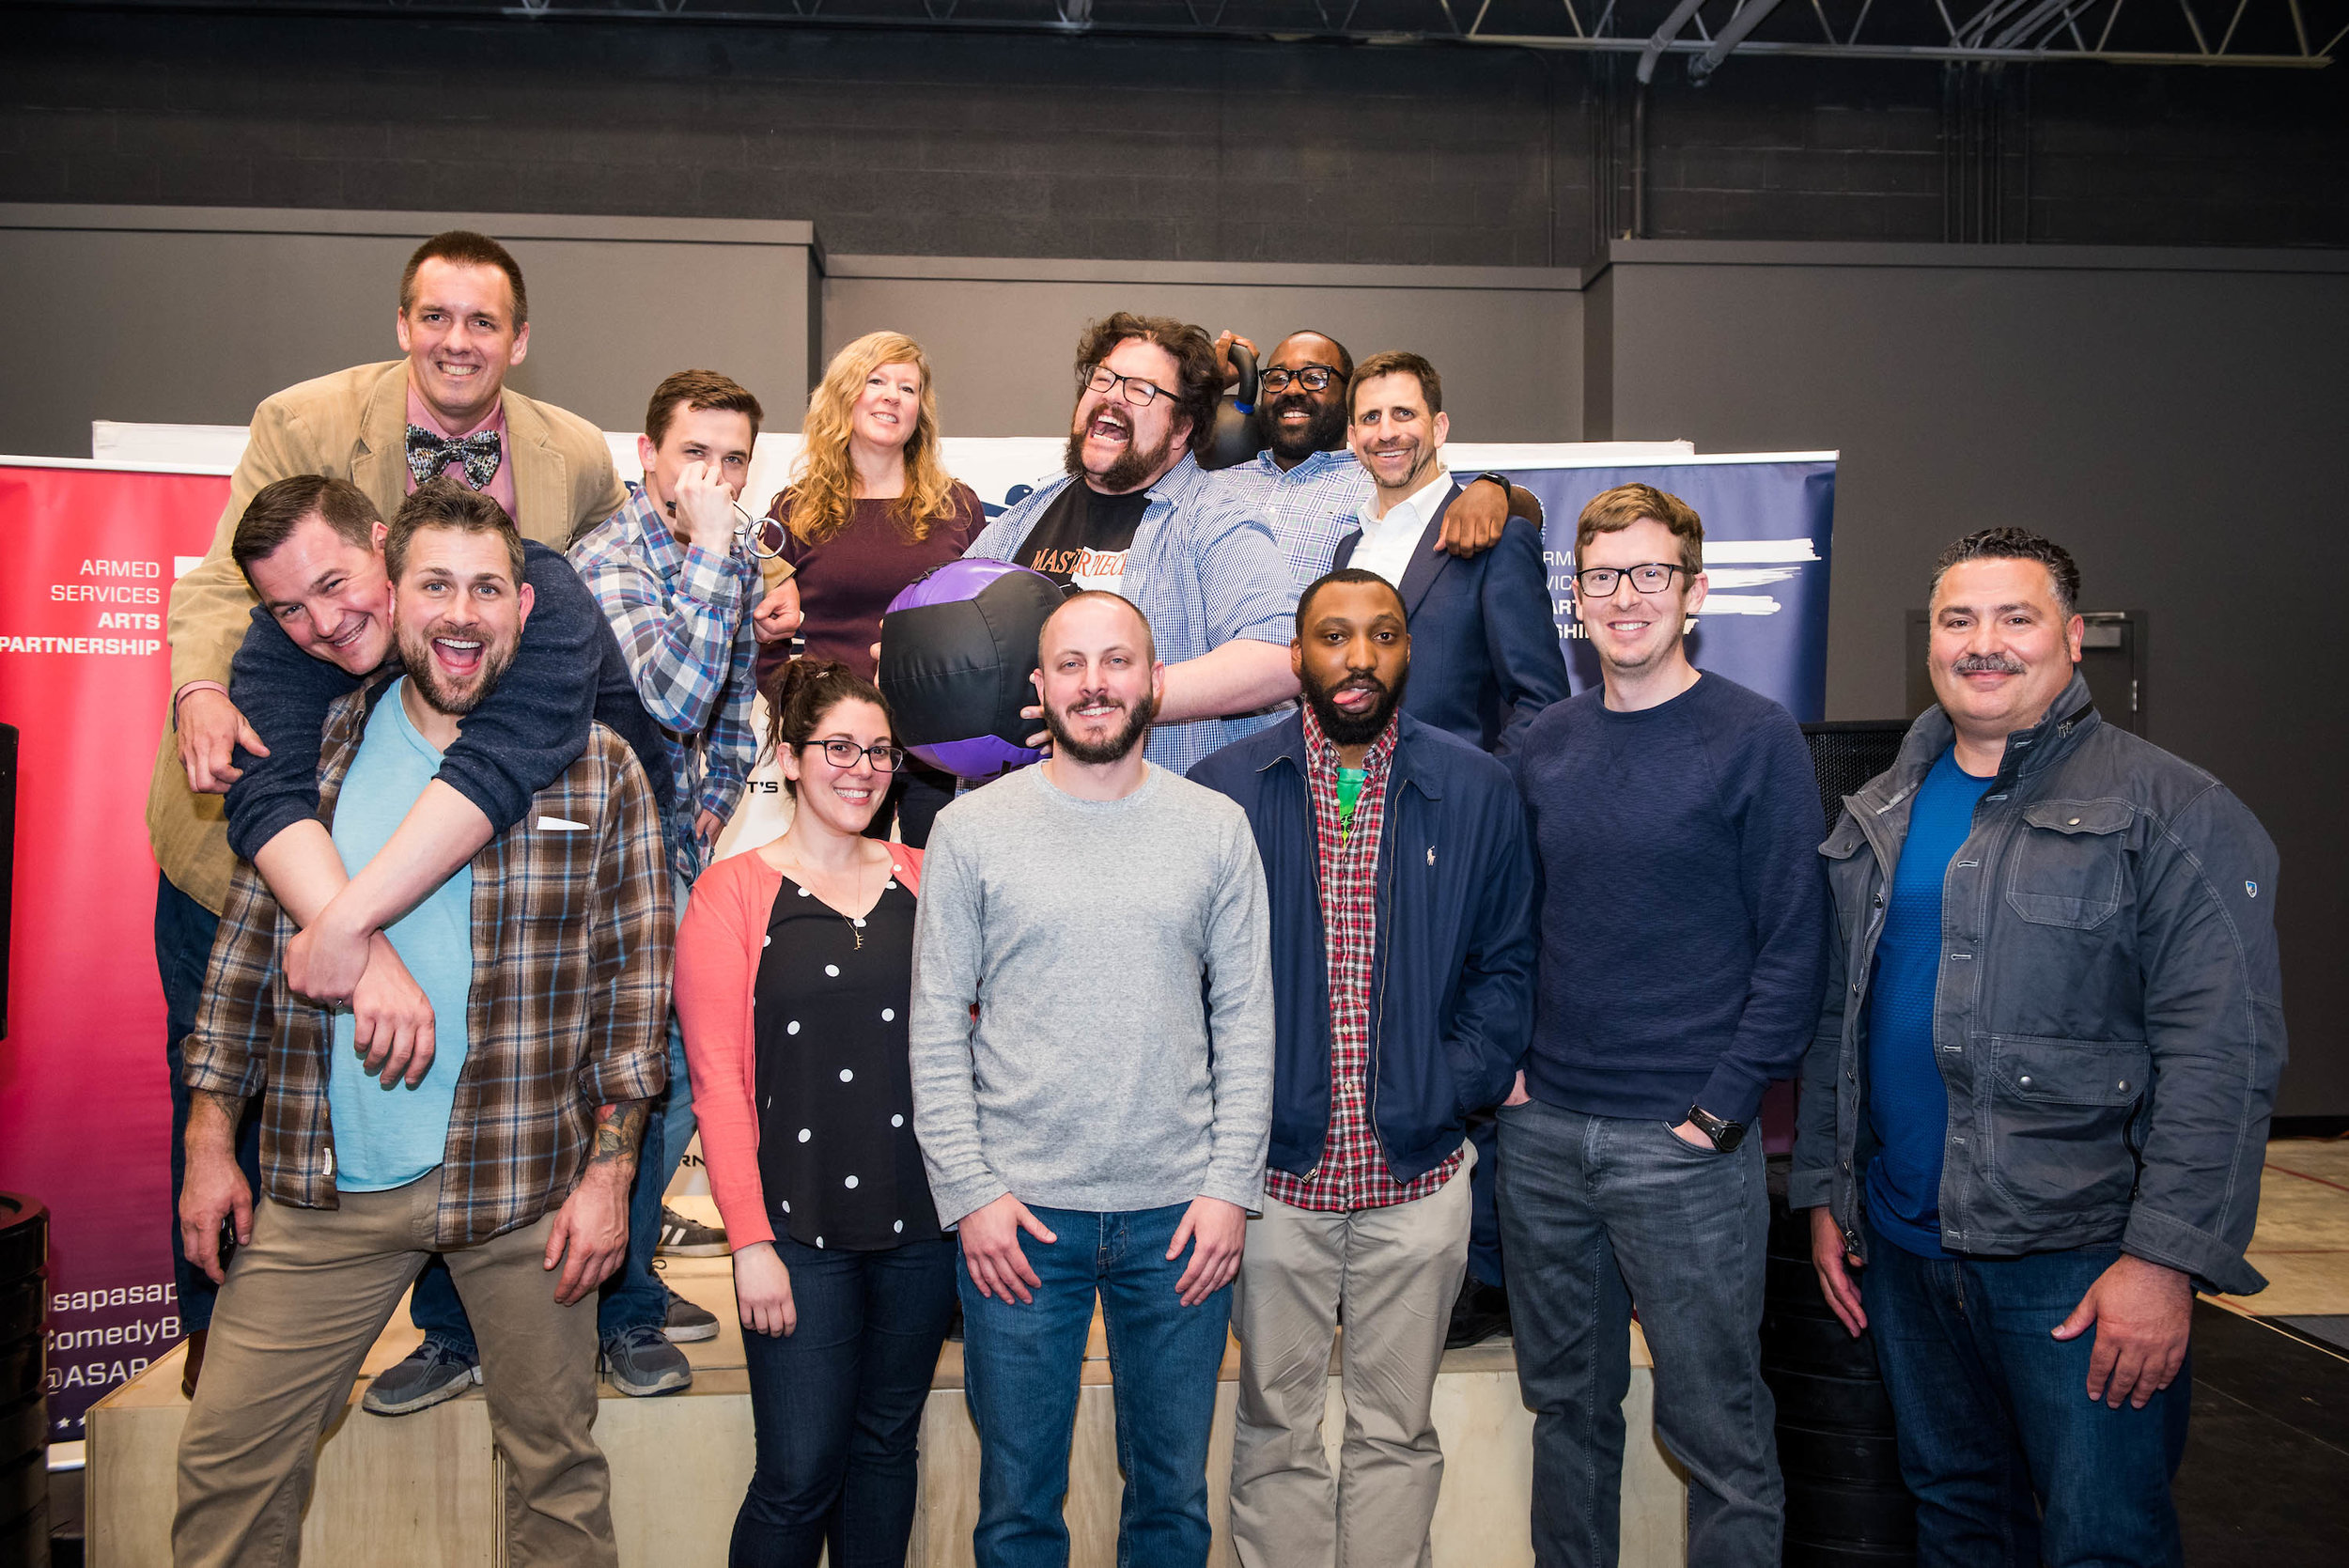 ASAP-RWB Comedy Showcase-Alexandria VA-04-05-2019-RCD-169.jpg